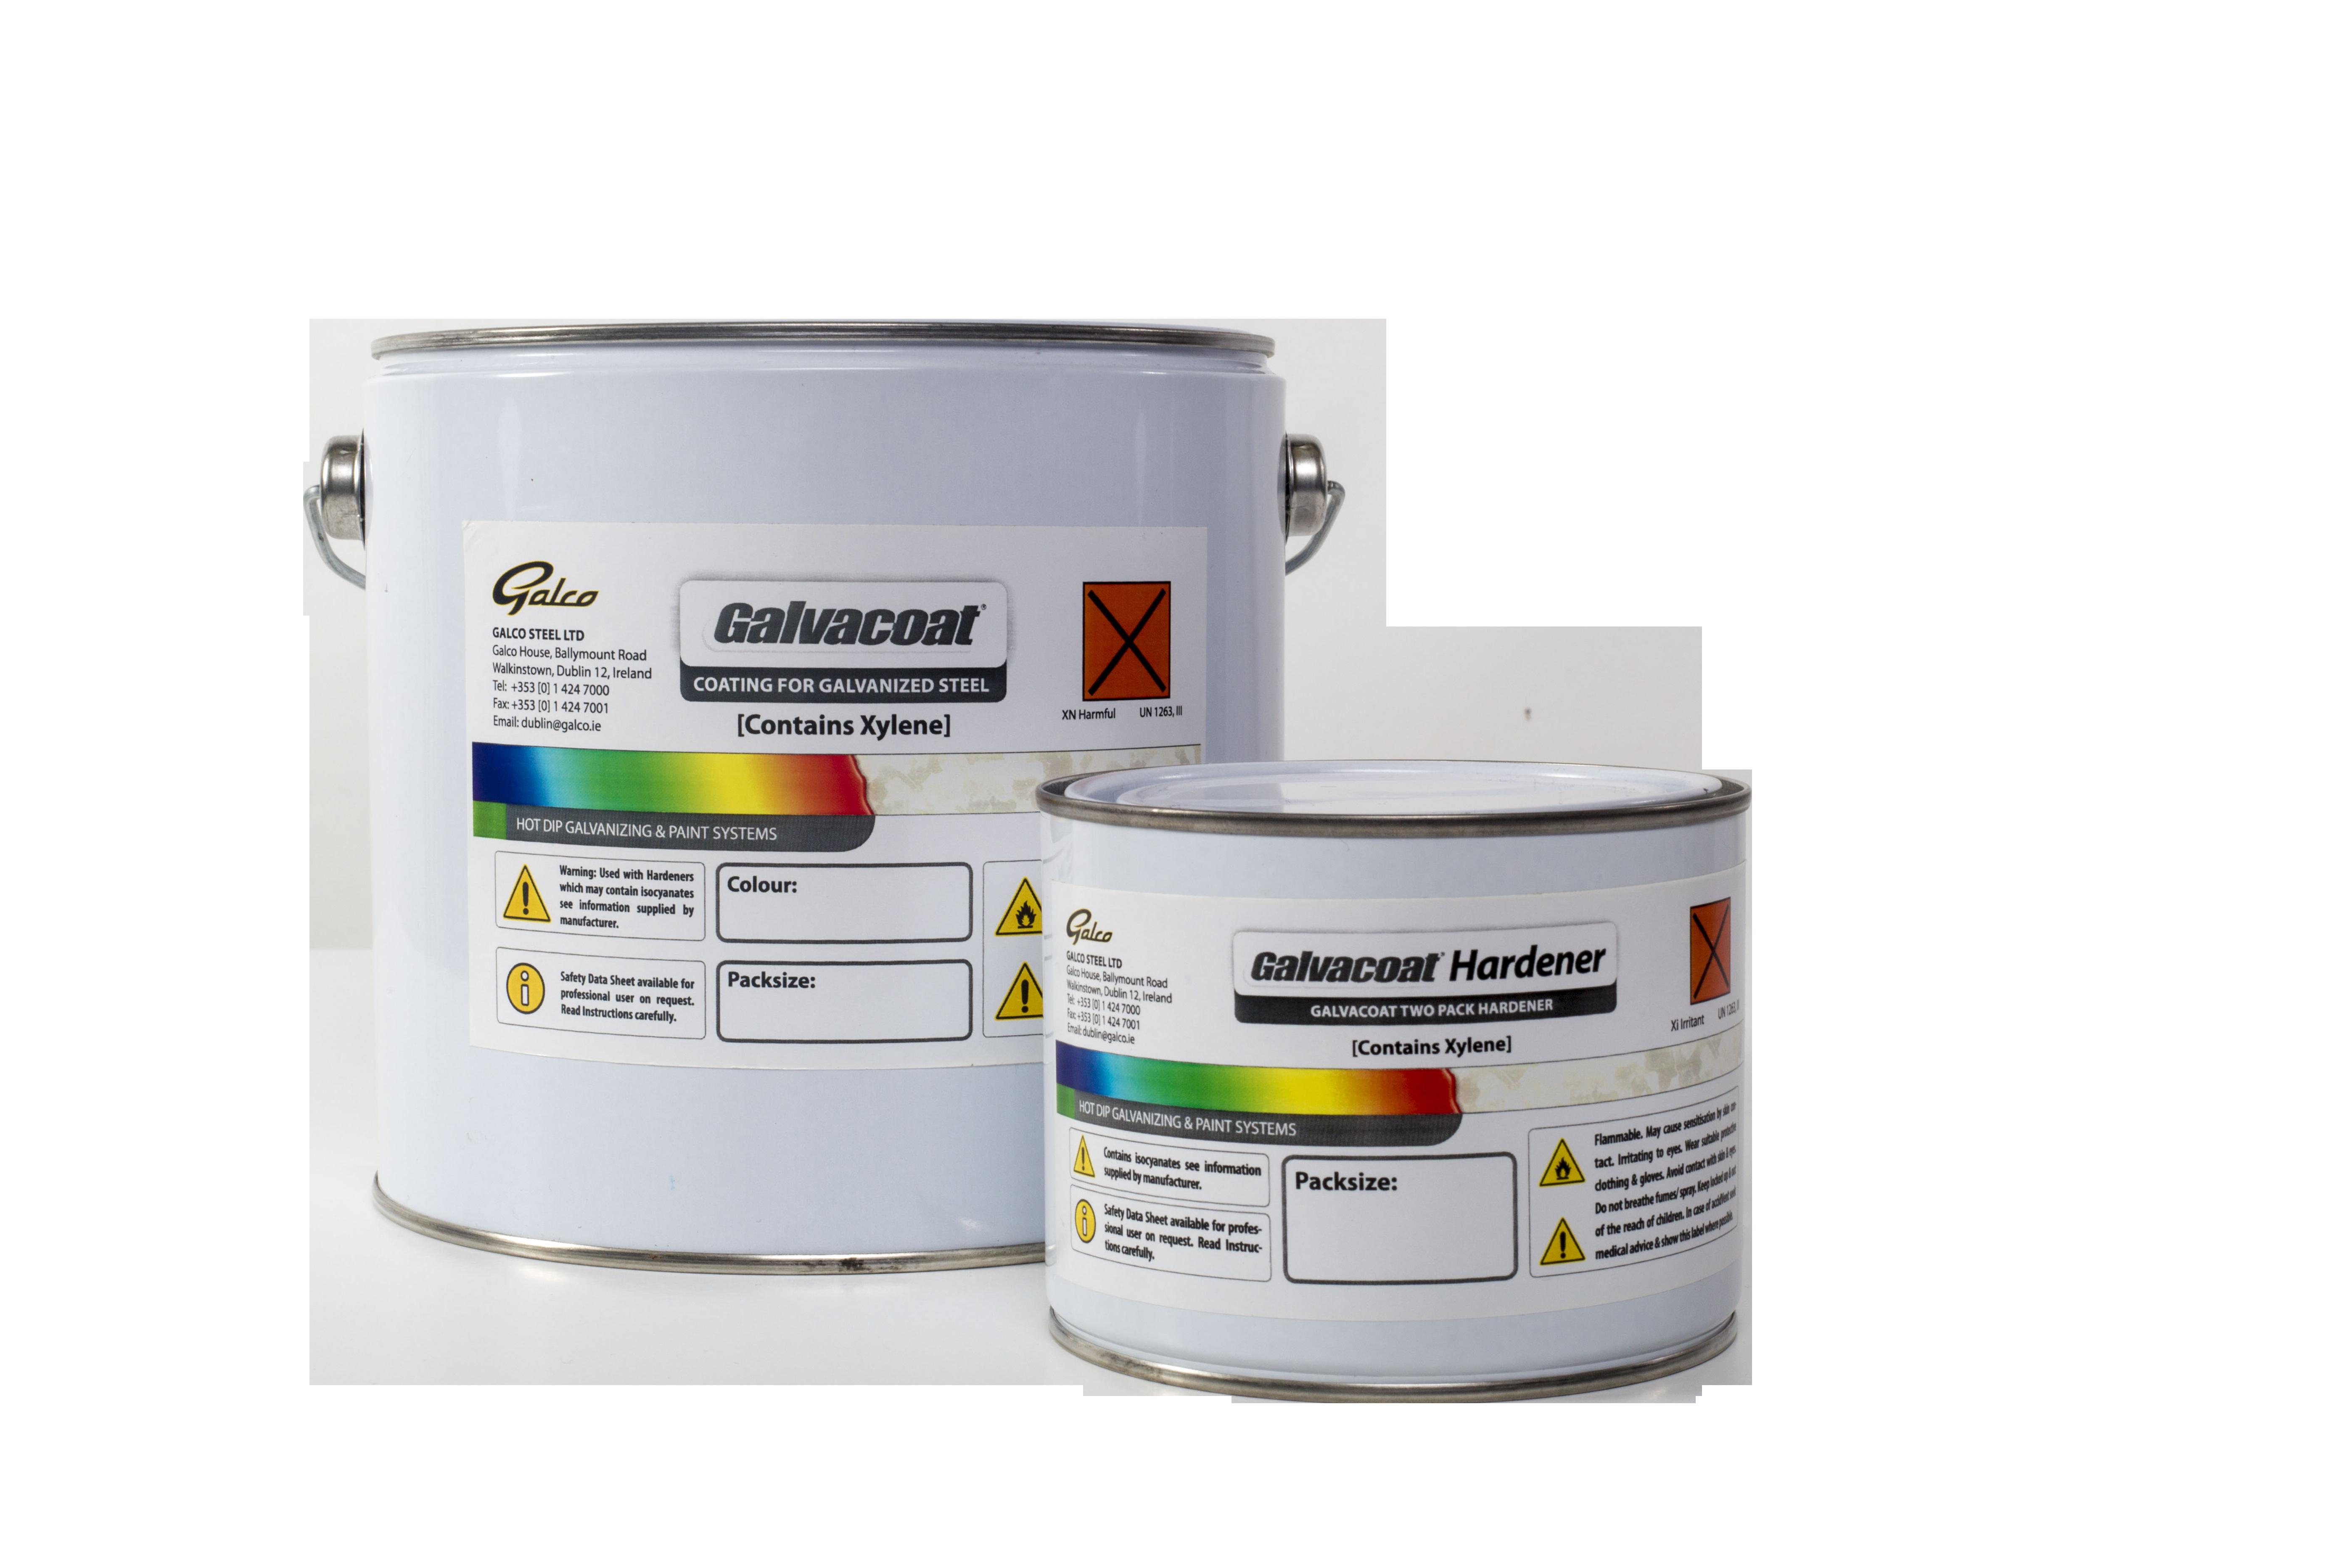 Best Paint for Galvanized Metal | Galco Hot Dip Galvanizing